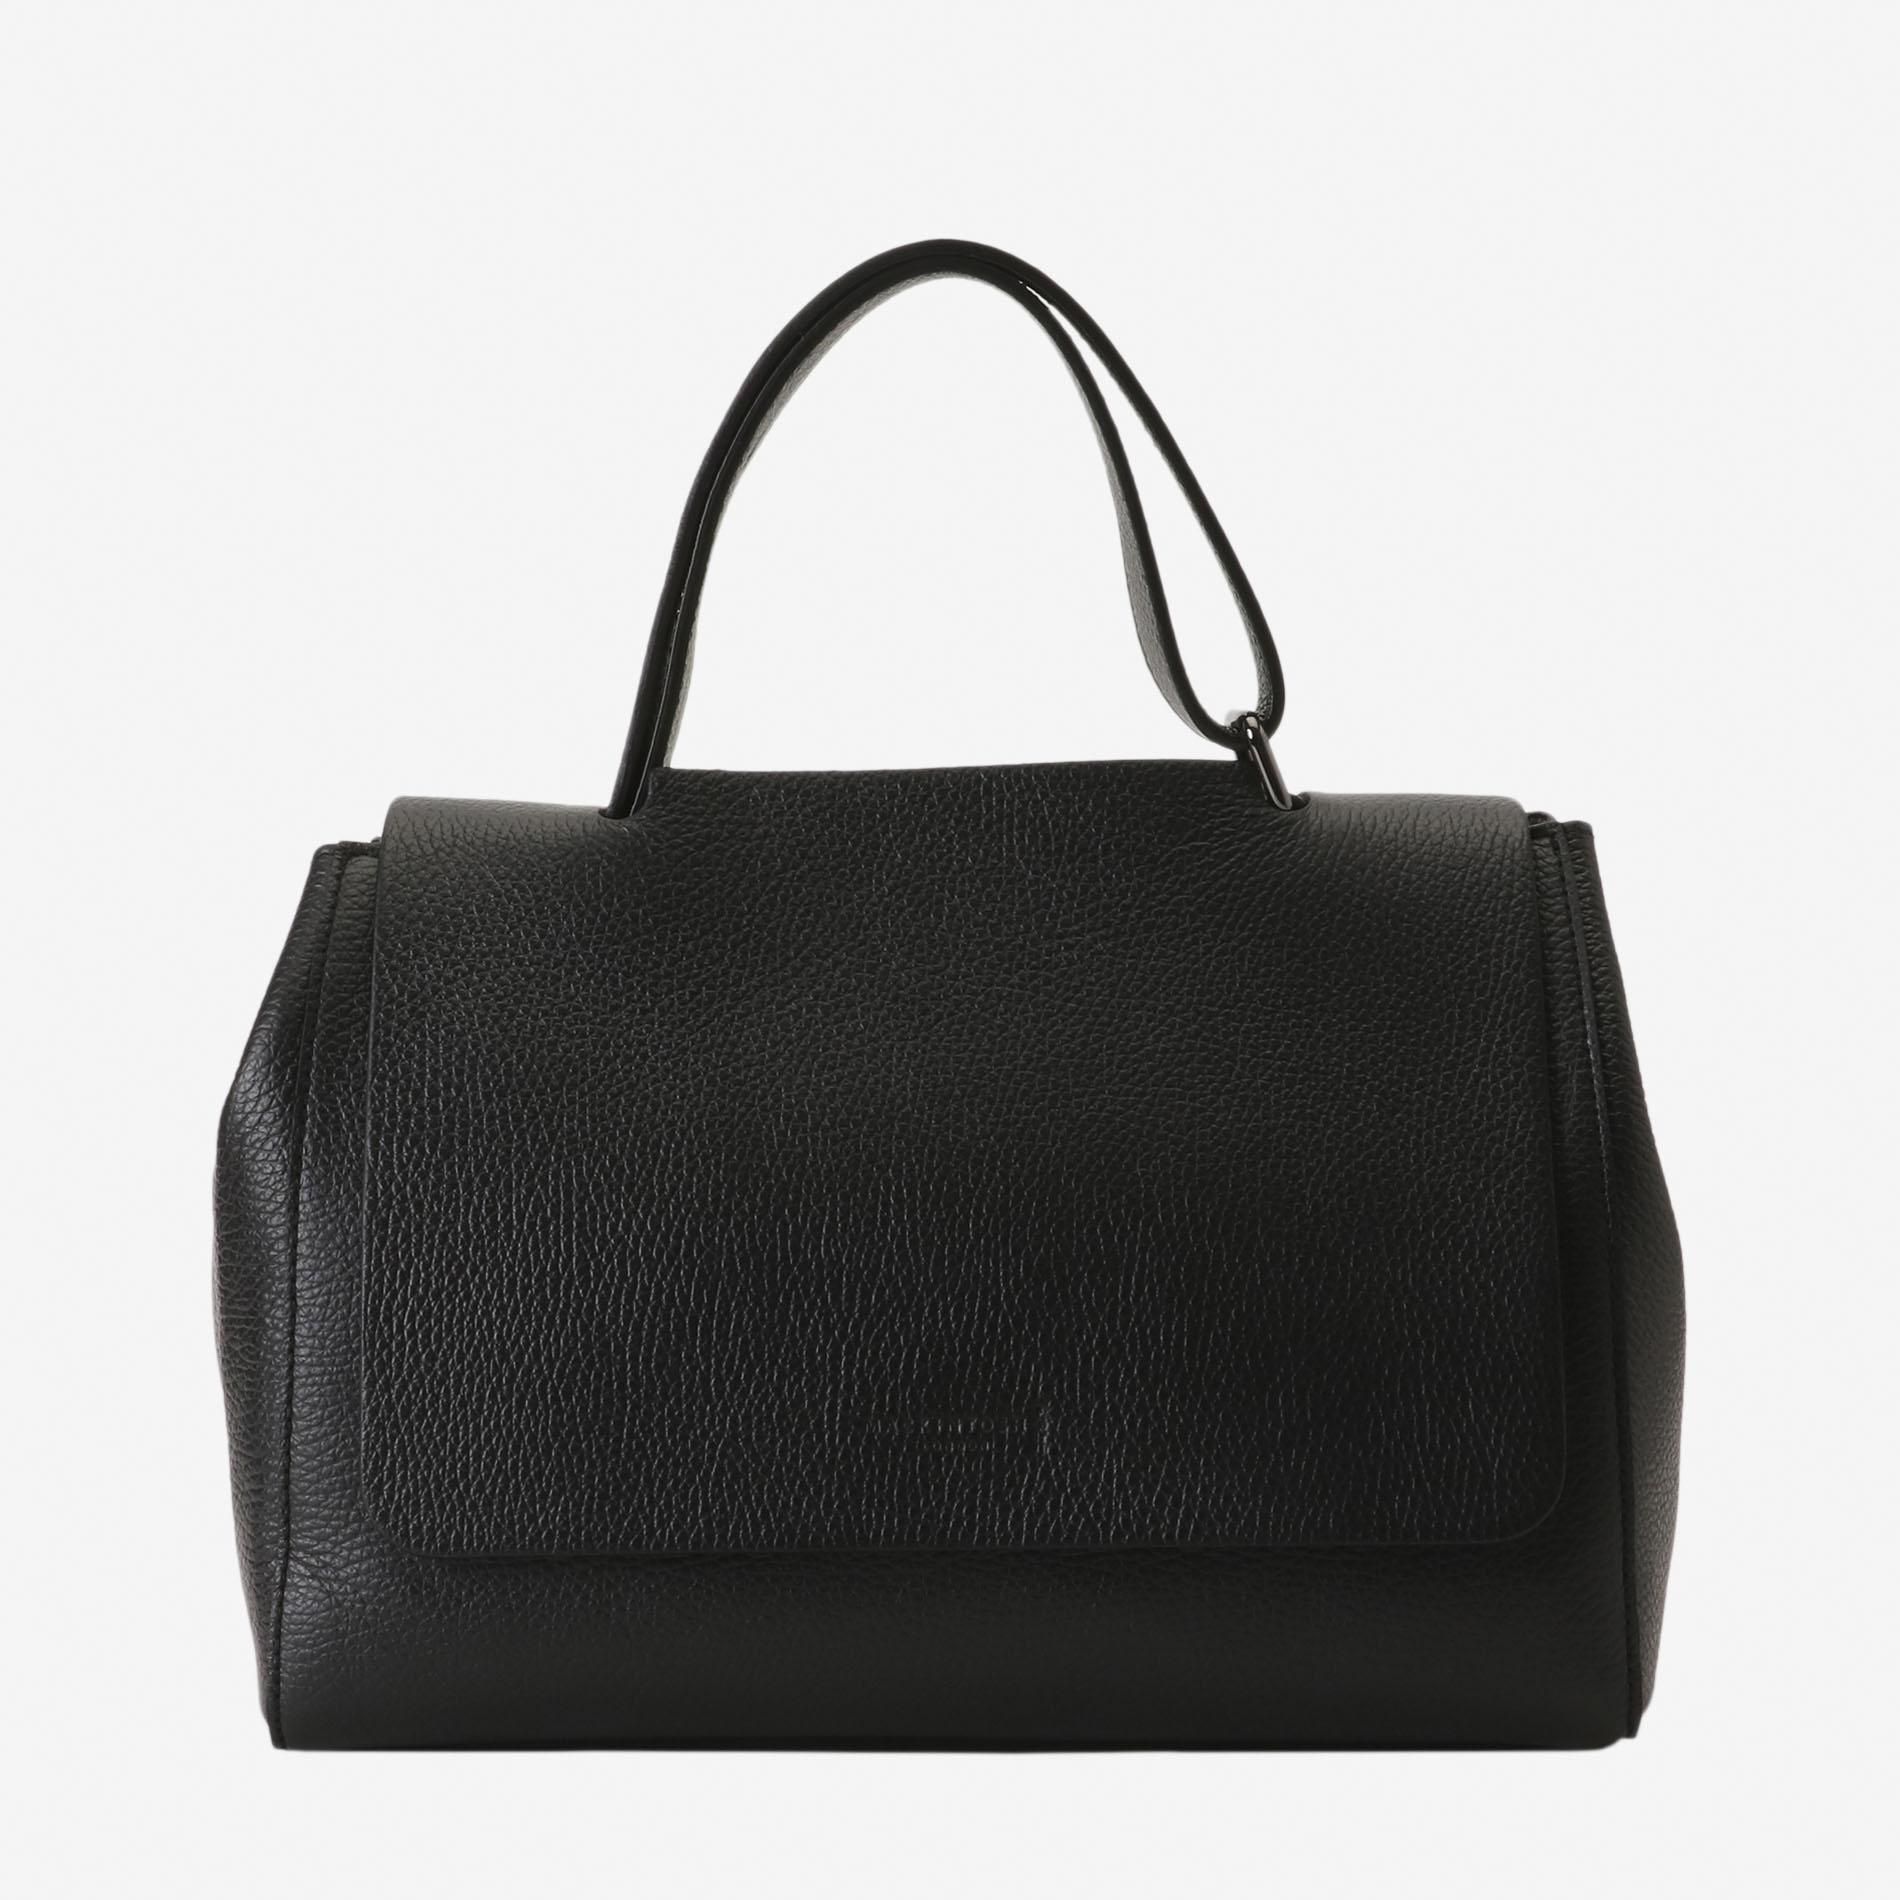 Marantハンドバッグ